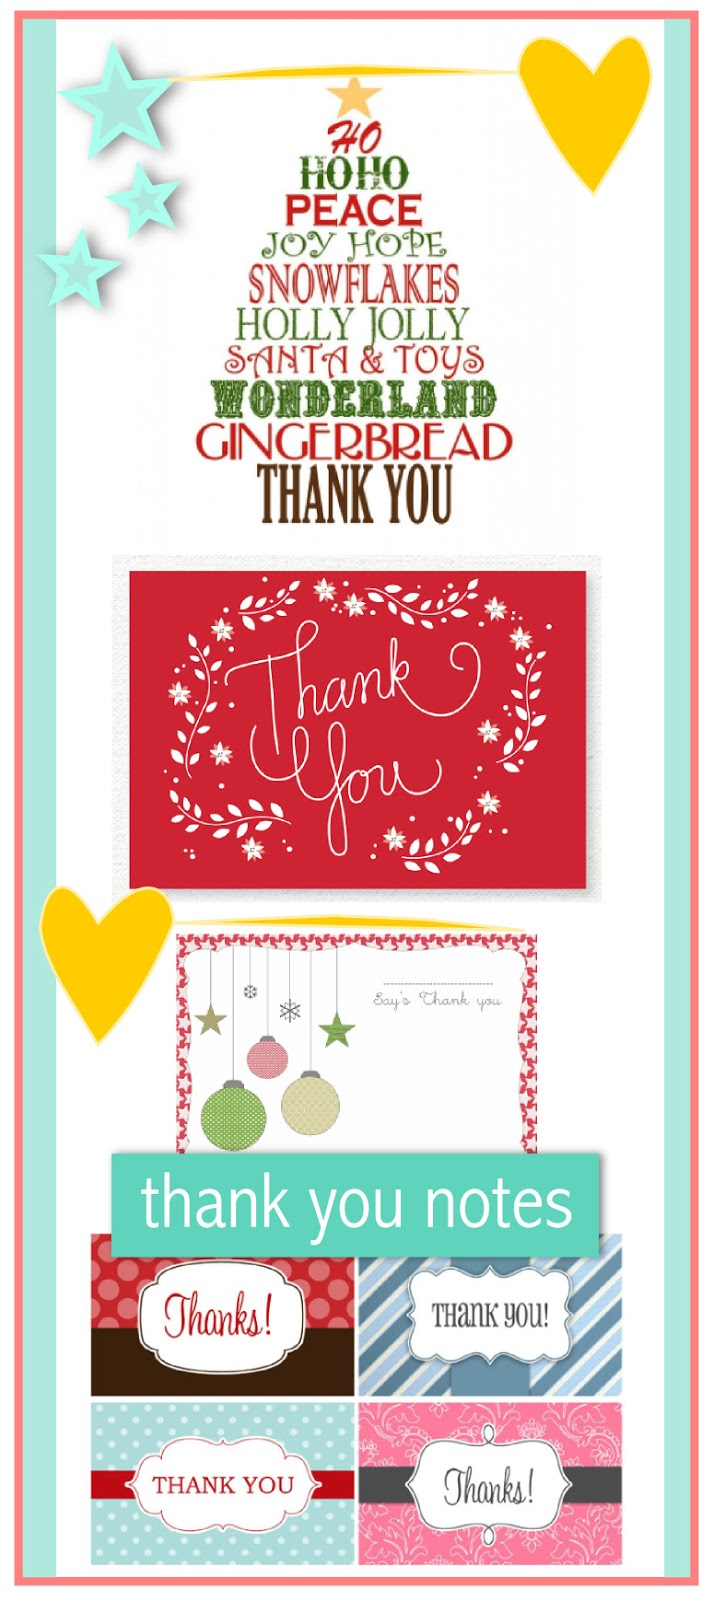 10 free printable Christmas thank you notes